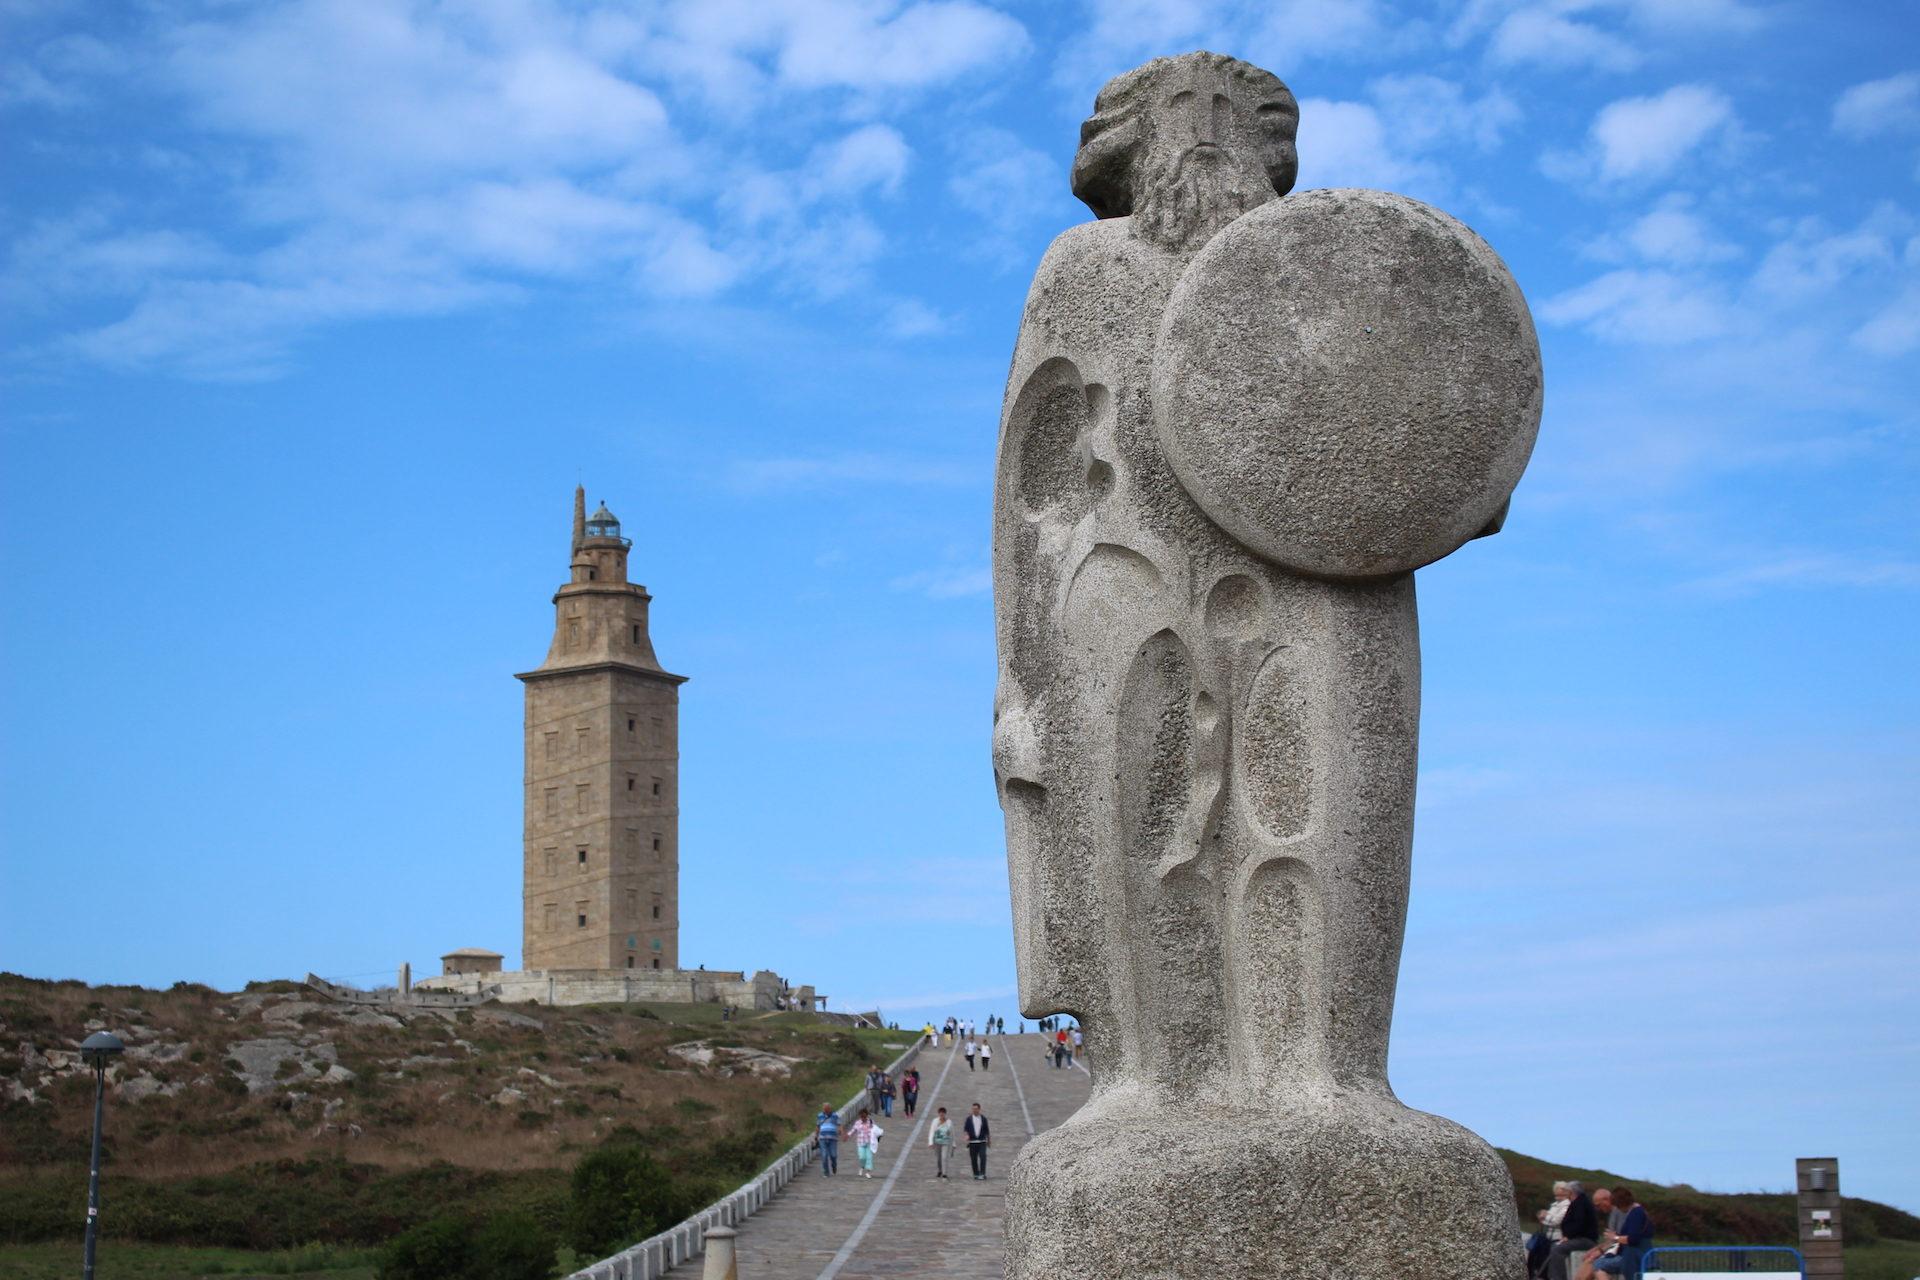 टॉवर, hércules, a coruña, galicia, आकाश - HD वॉलपेपर - प्रोफेसर-falken.com